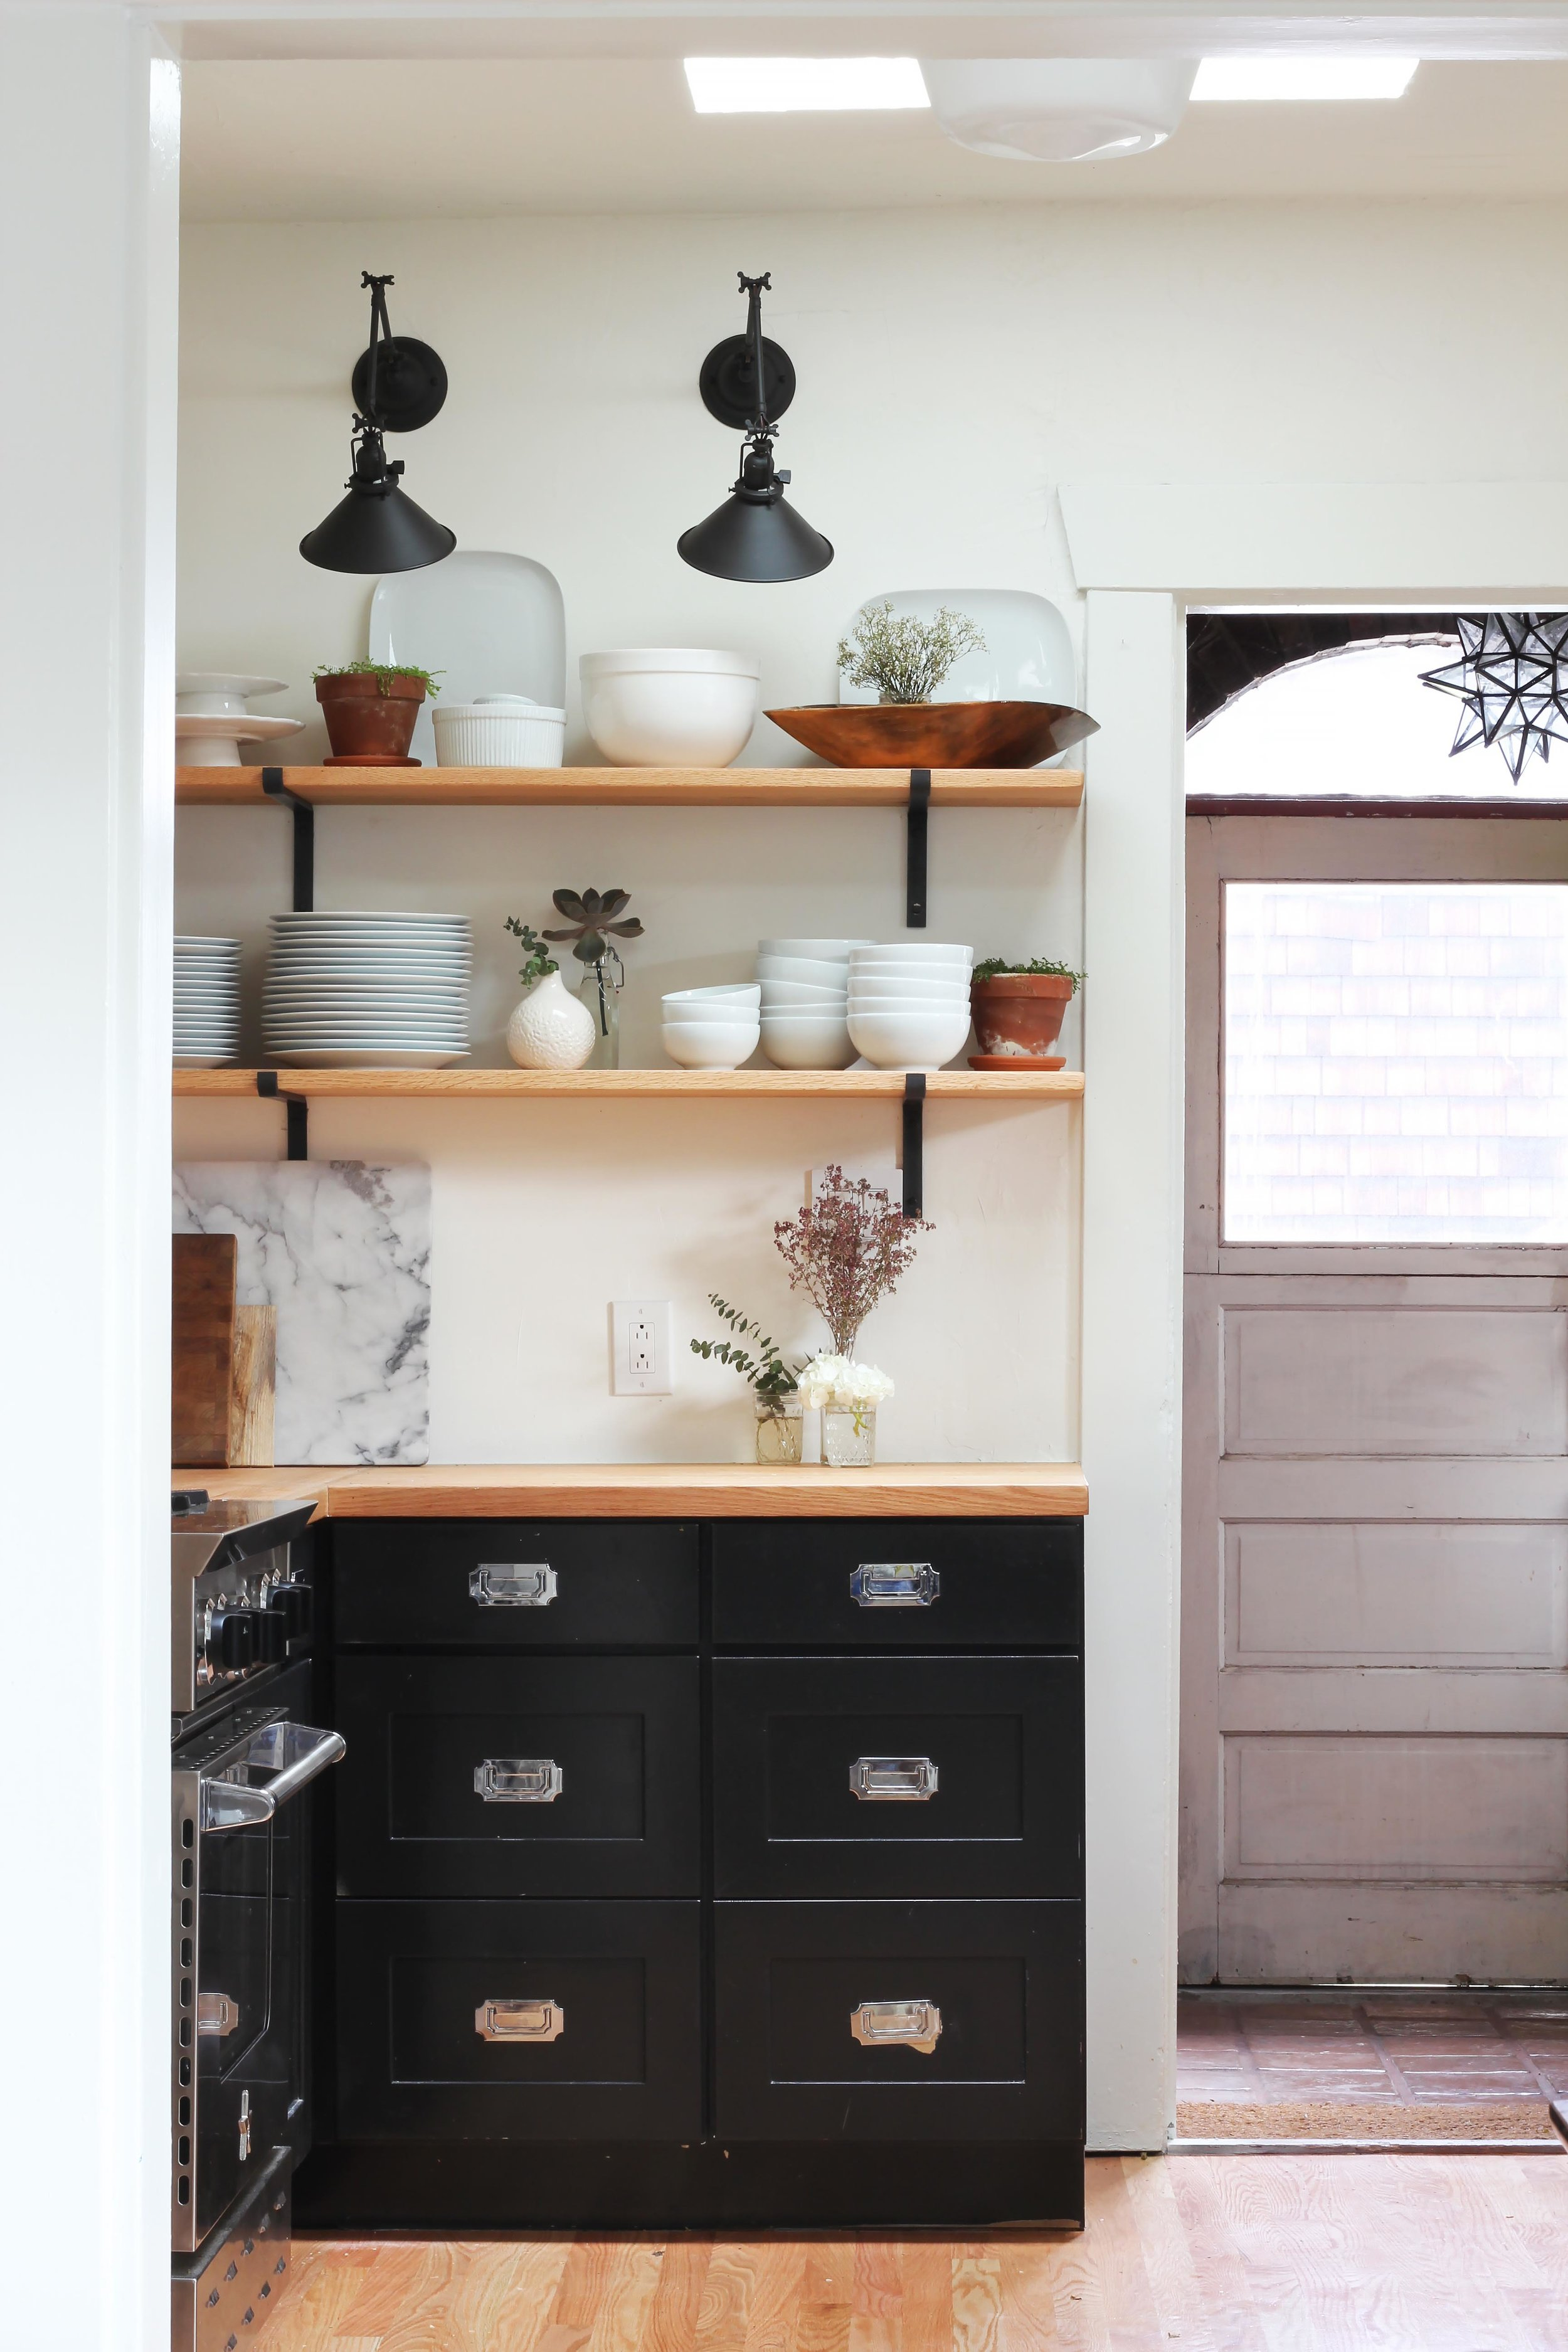 The Grit and Polish - Dexter Kitchen Renovation Open Shelves.jpg